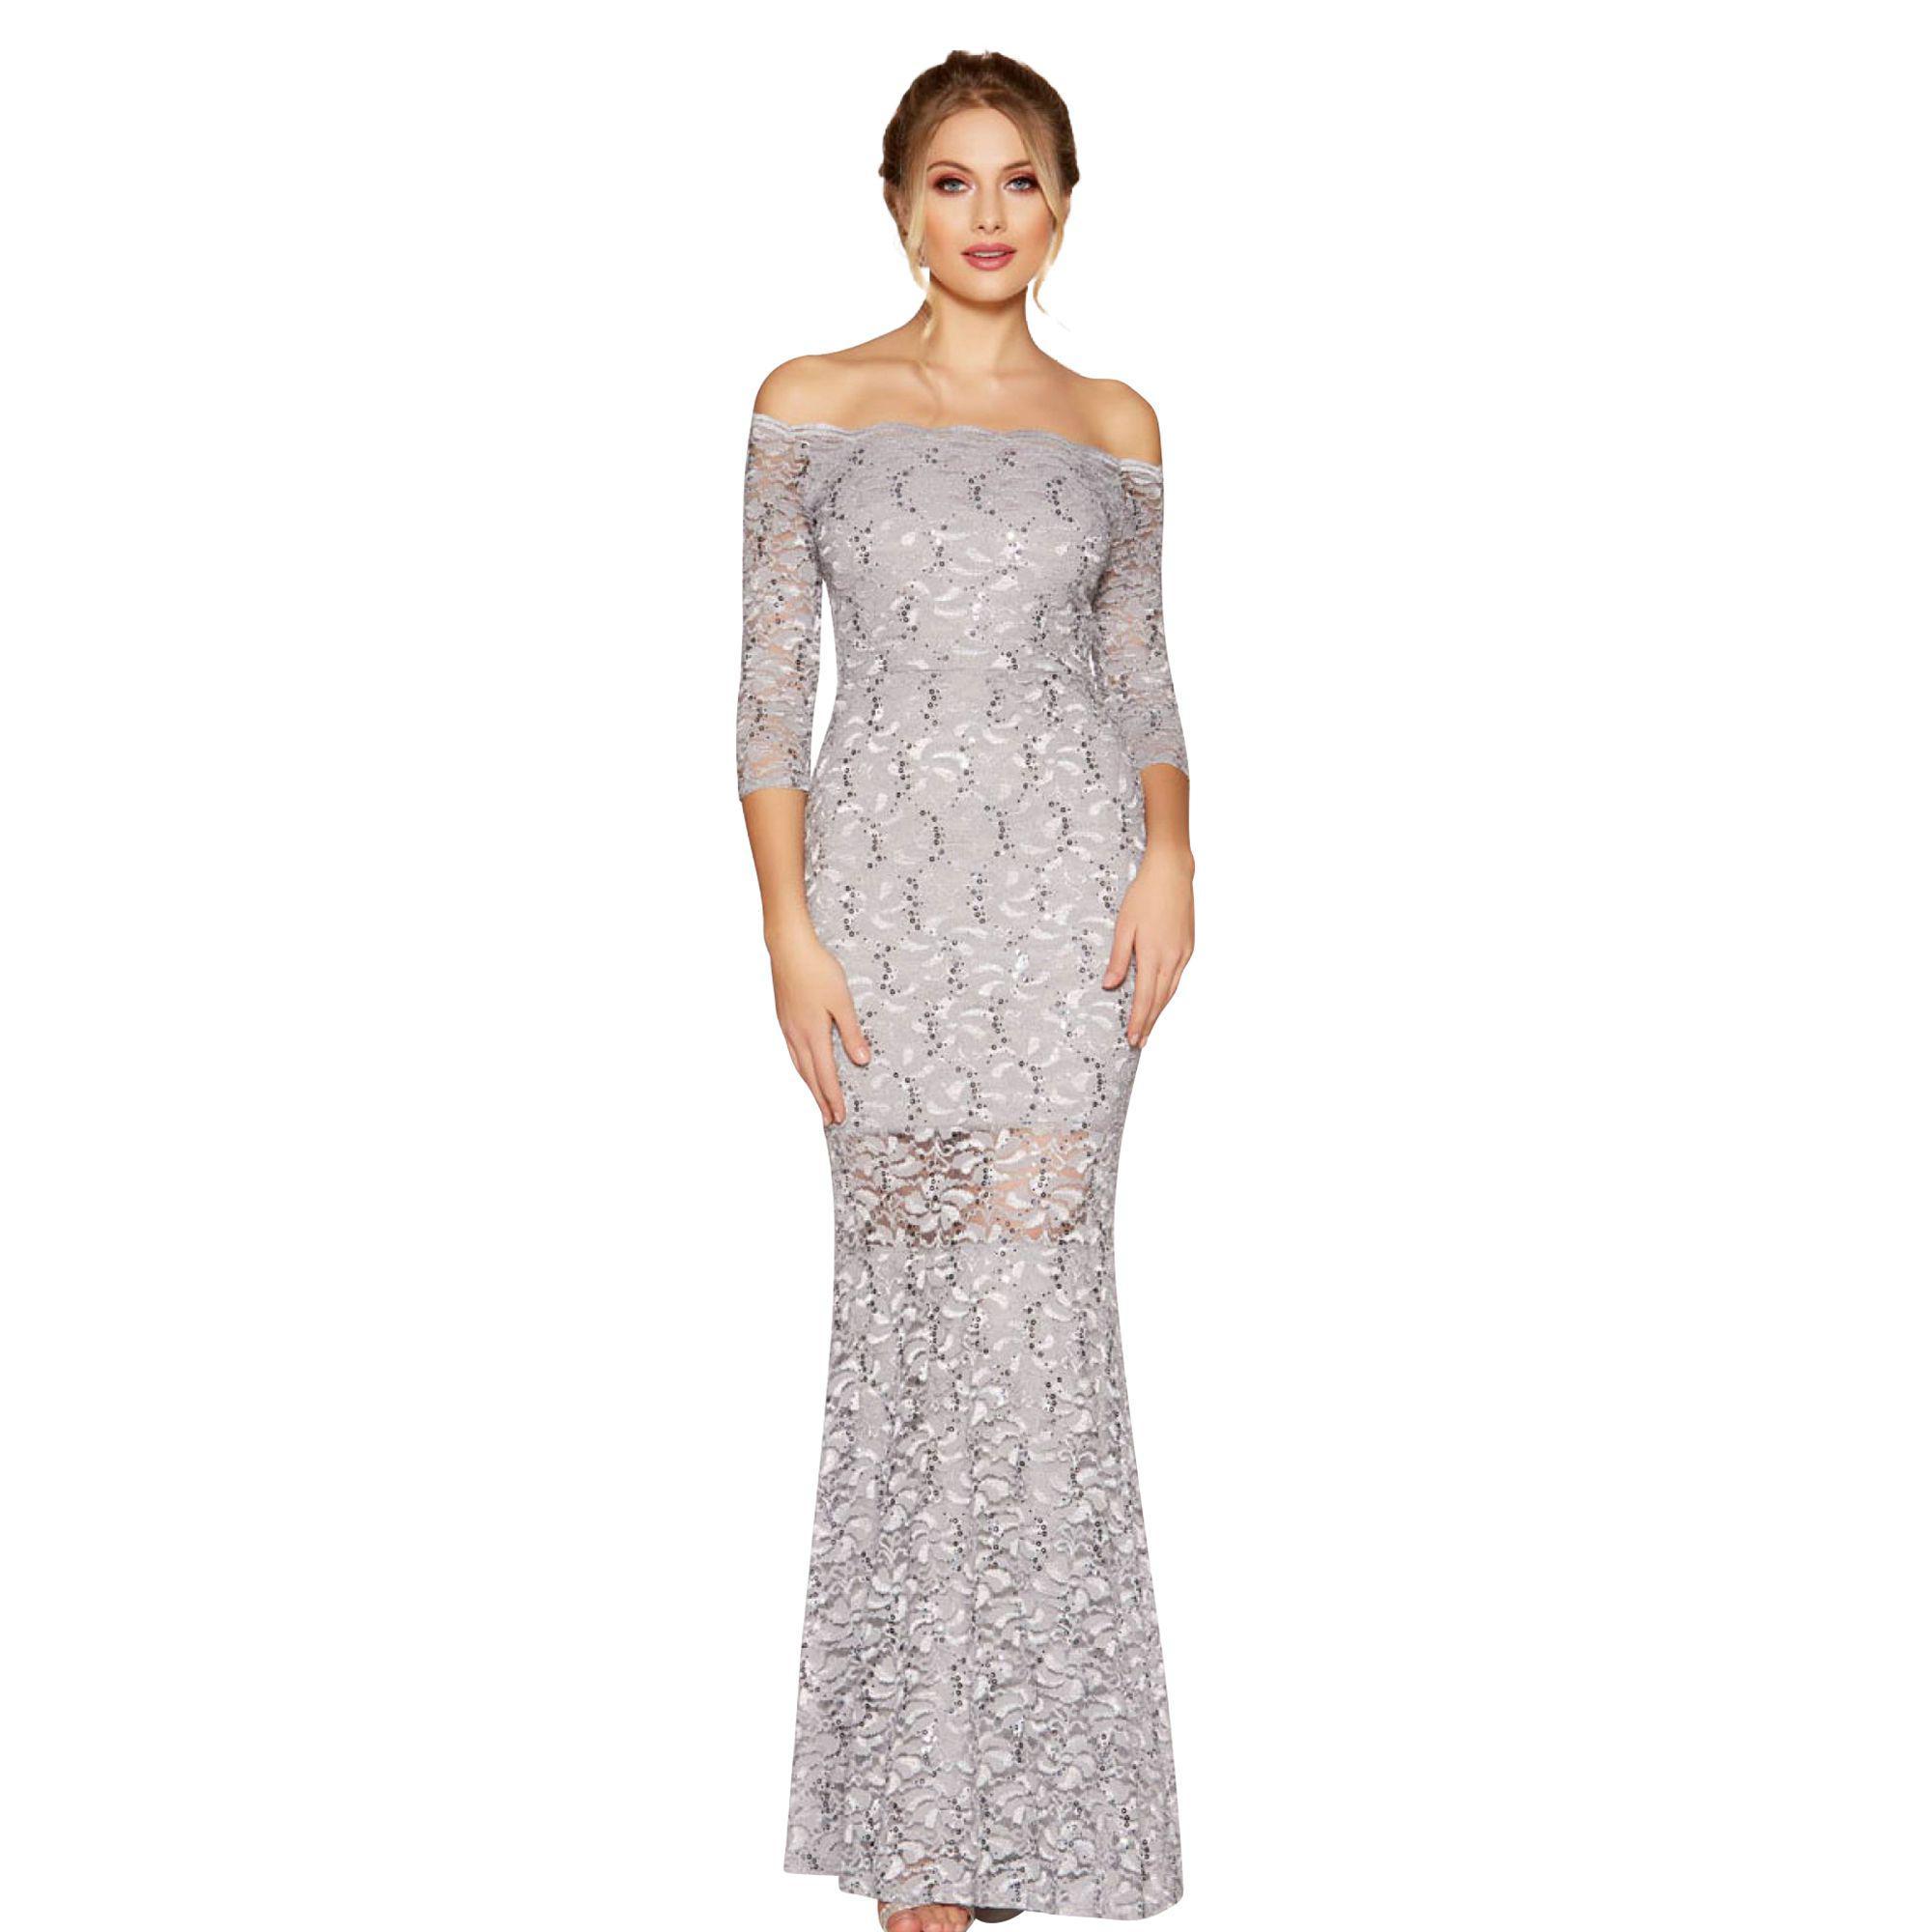 5f63b831d1 Quiz Black And Rose Gold Sequin Bardot Maxi Dress - Data Dynamic AG